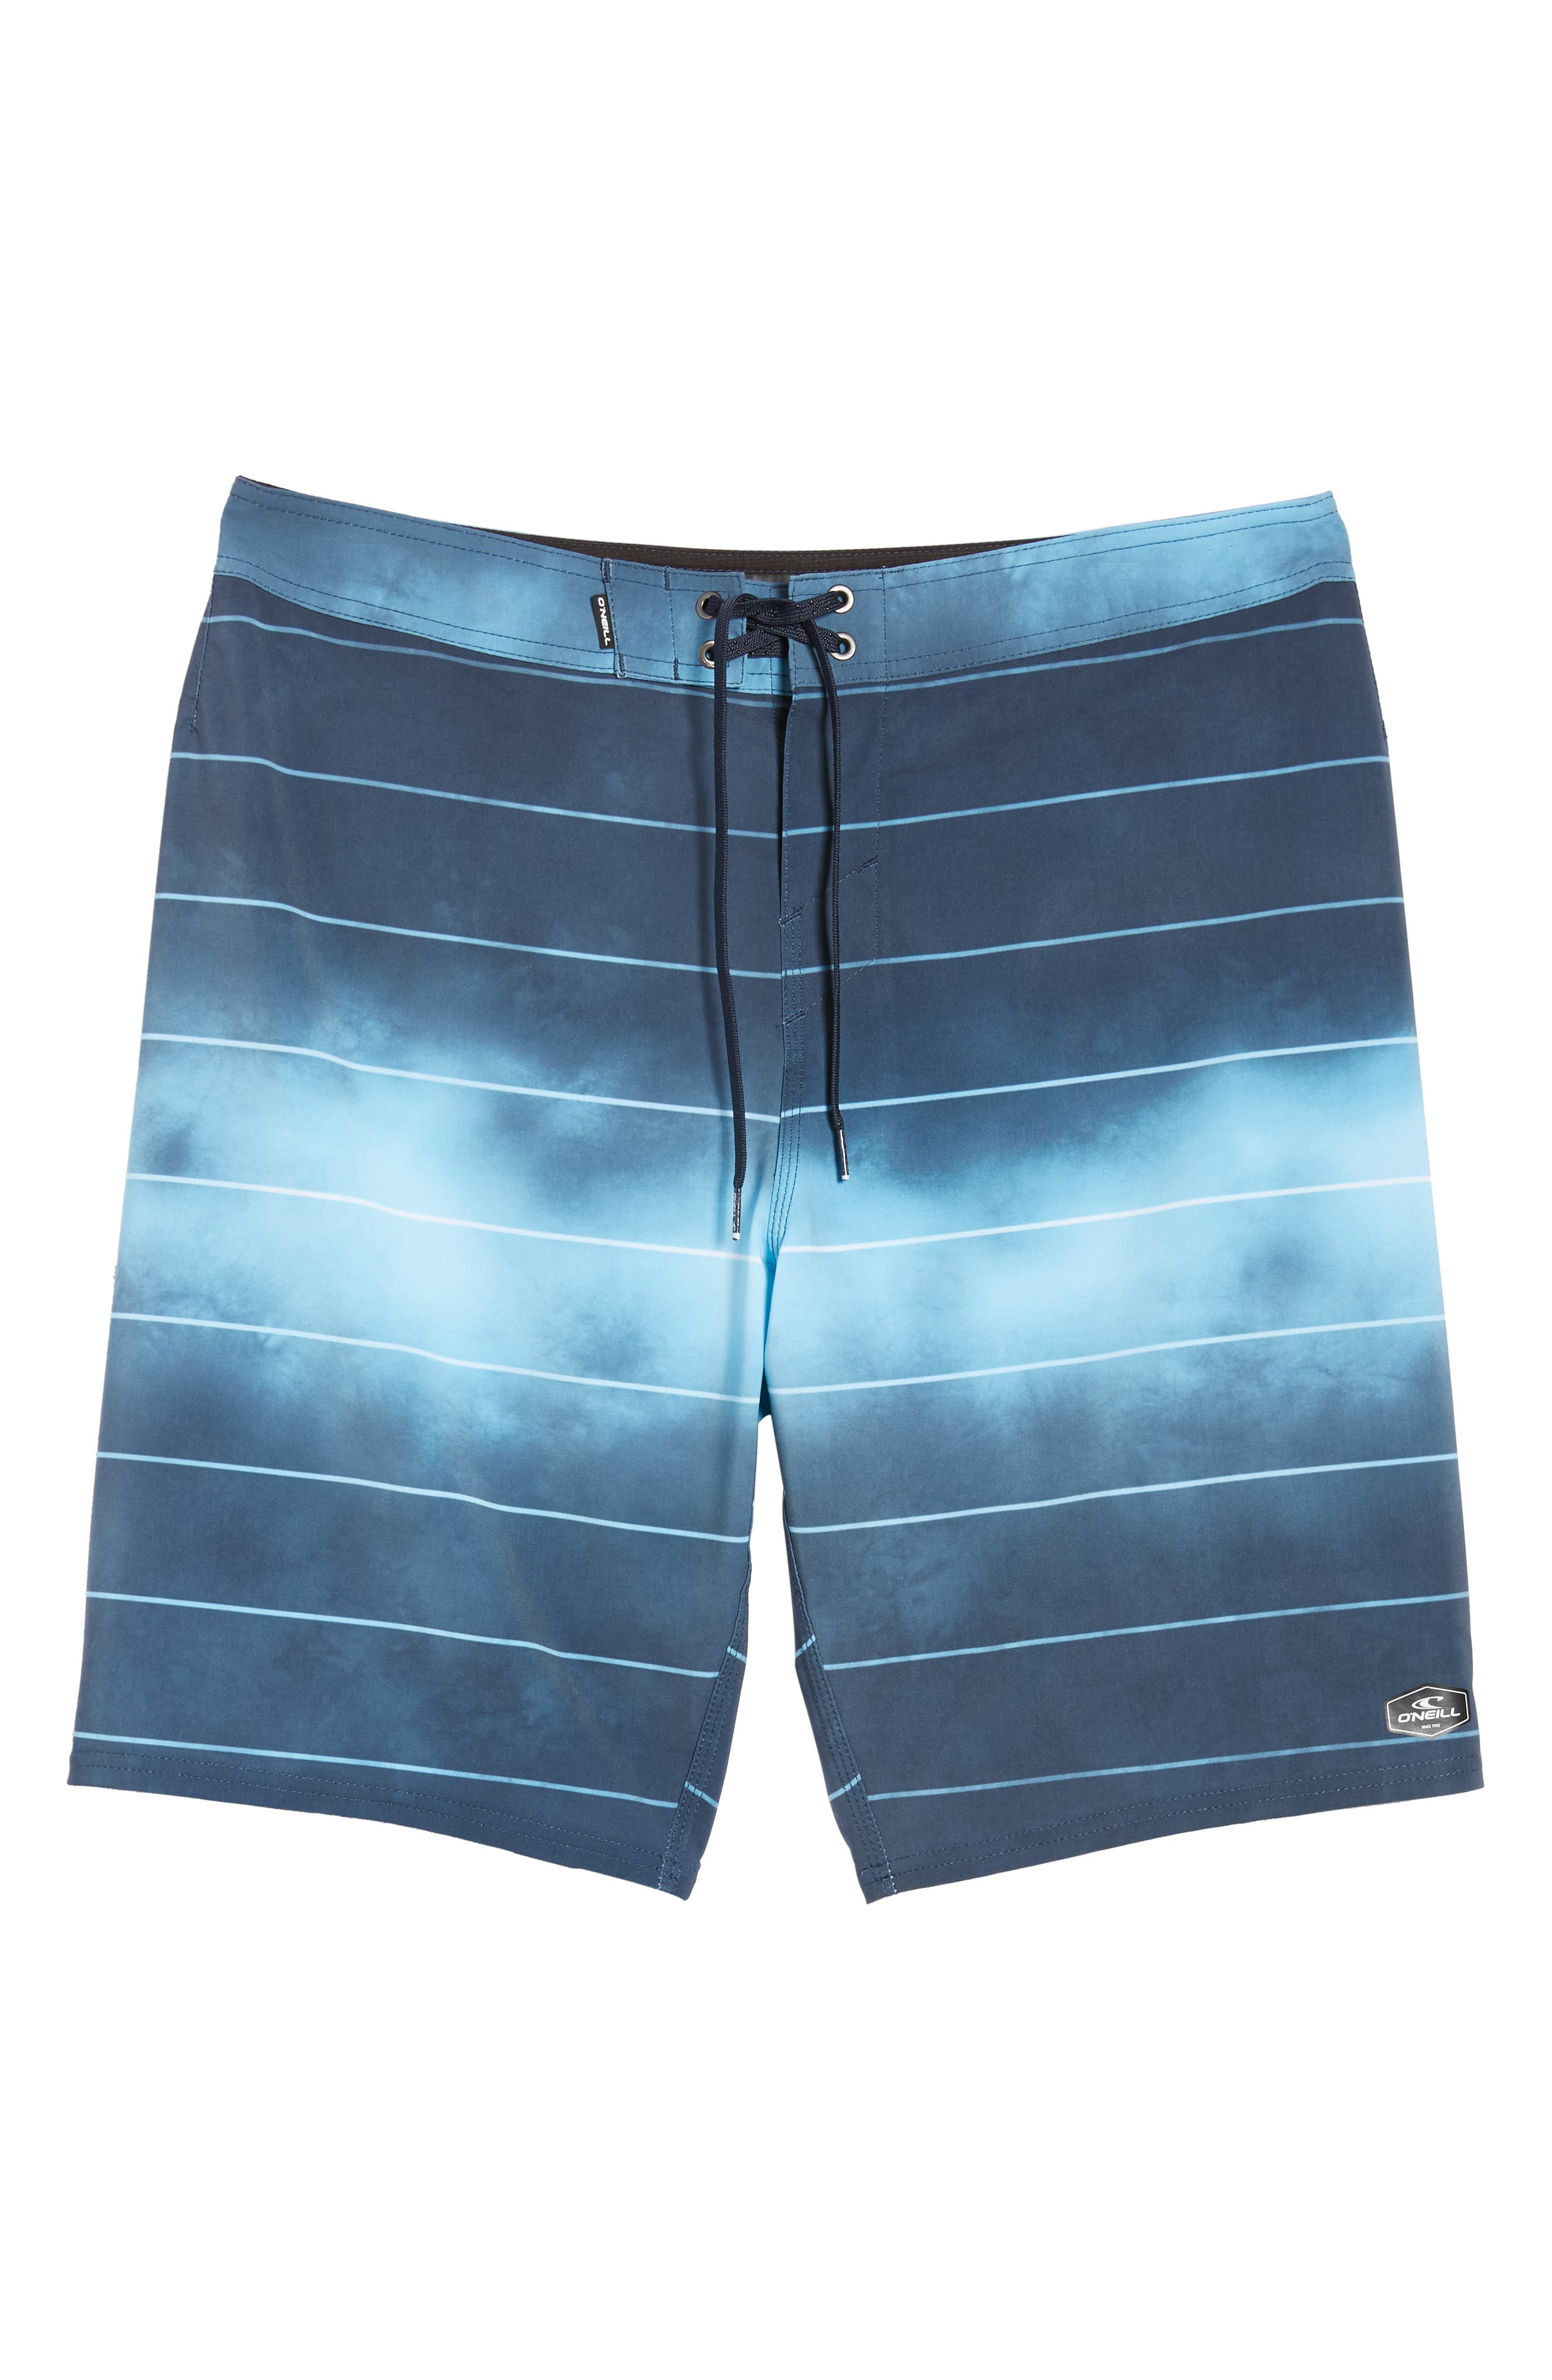 Hyperfreak Smokey Mirrors Board Shorts,                             Alternate thumbnail 6, color,                             NAVY